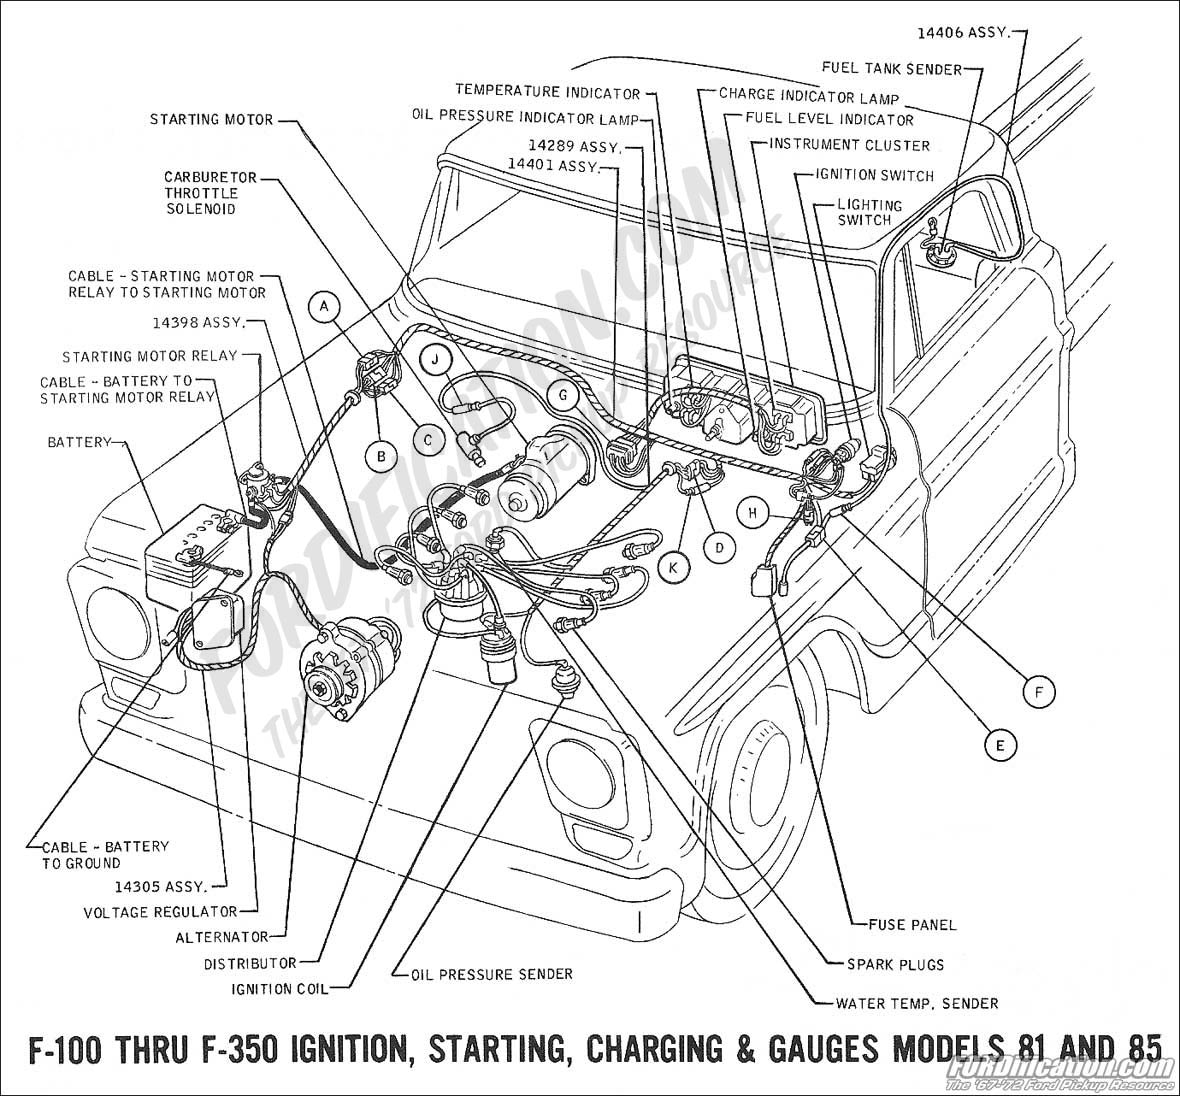 1967 Buick Skylark Wiring Diagram Daily Update Riviera To Battery Engine Pontiac Gto